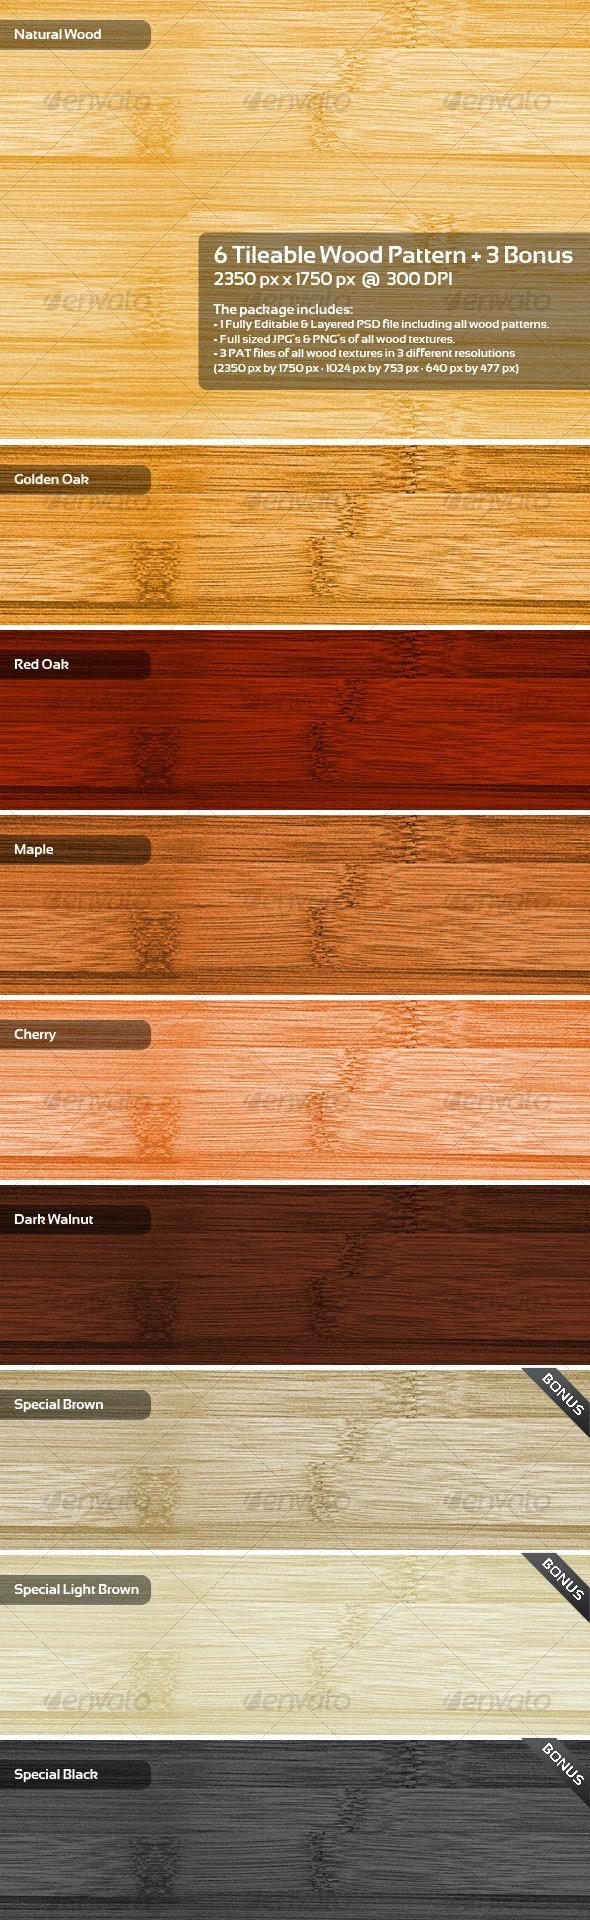 6 Tileable Wood Pattern + 3 Bonus - Photoshop Add-ons